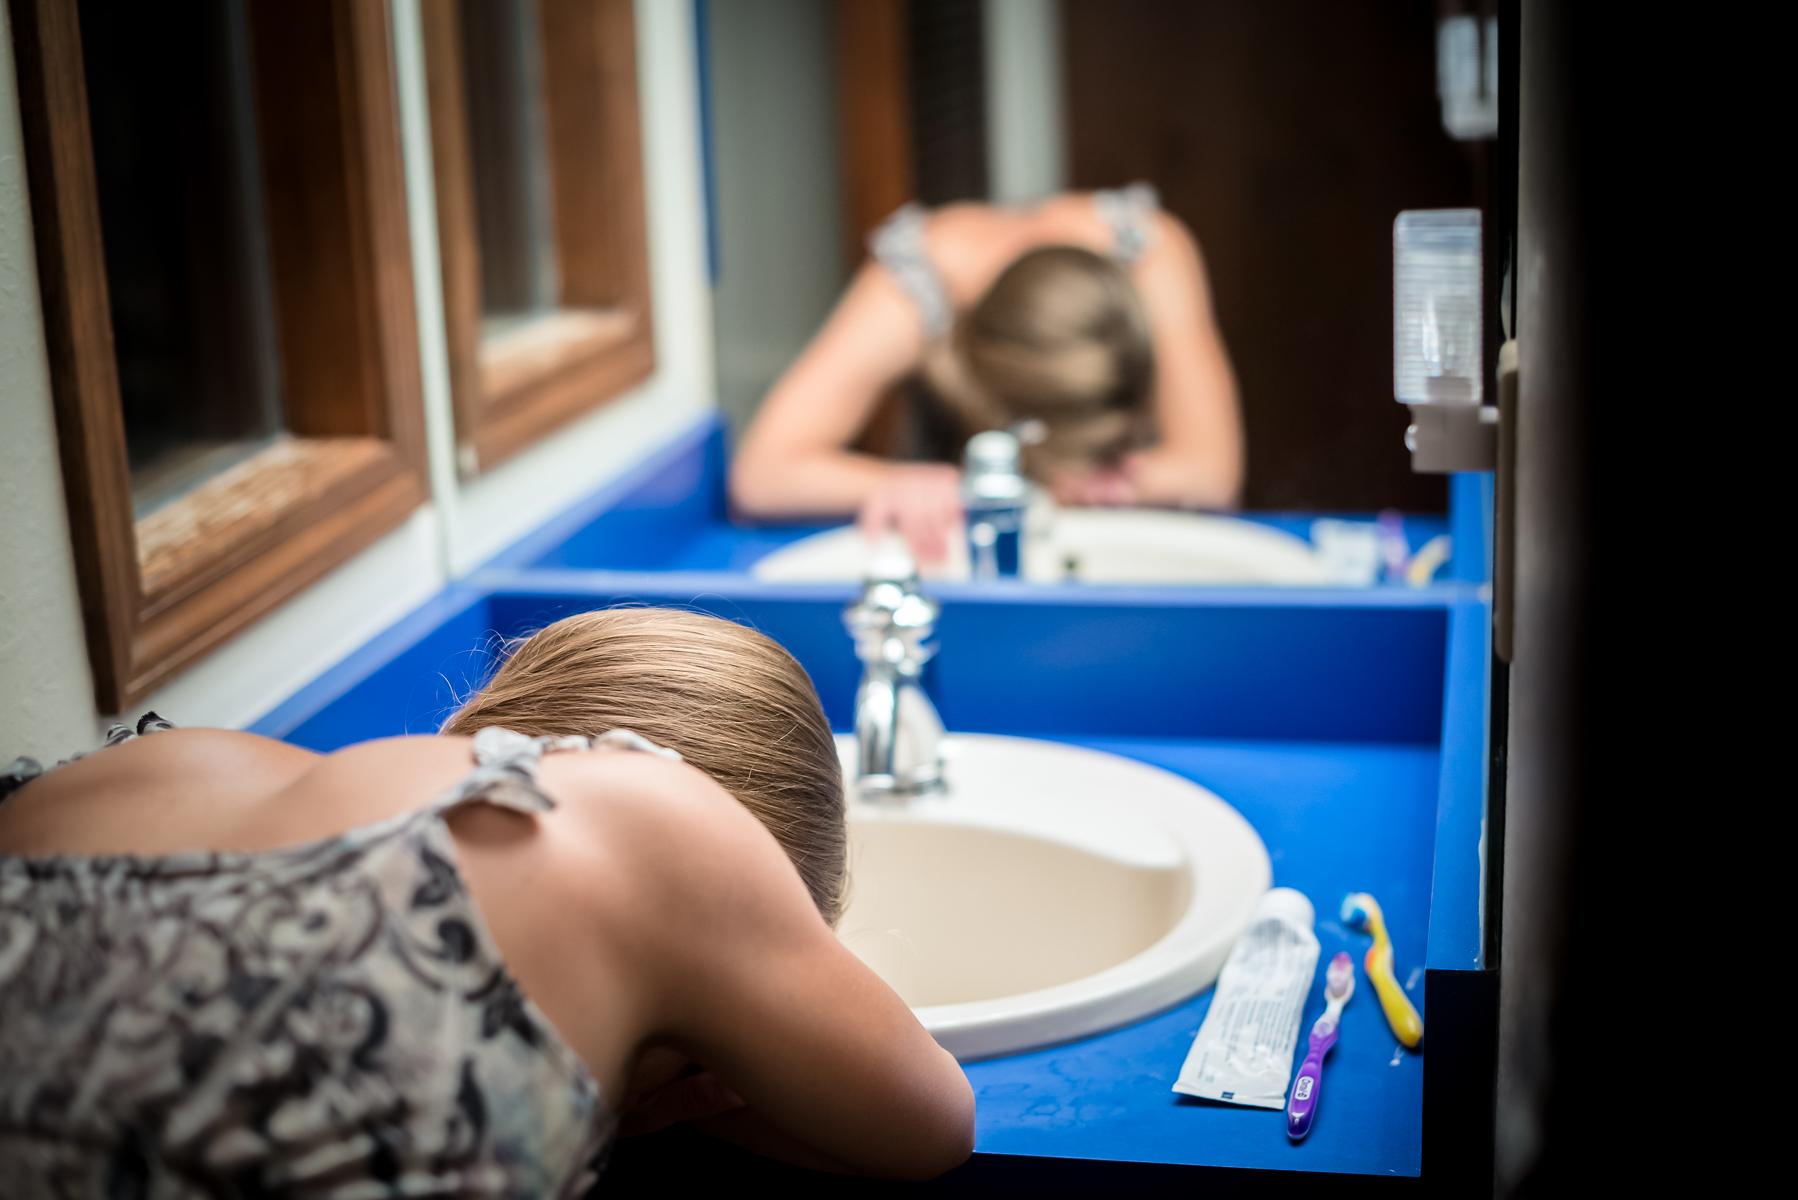 Colorado-springs-birth-photographer-home-birth-bathroom